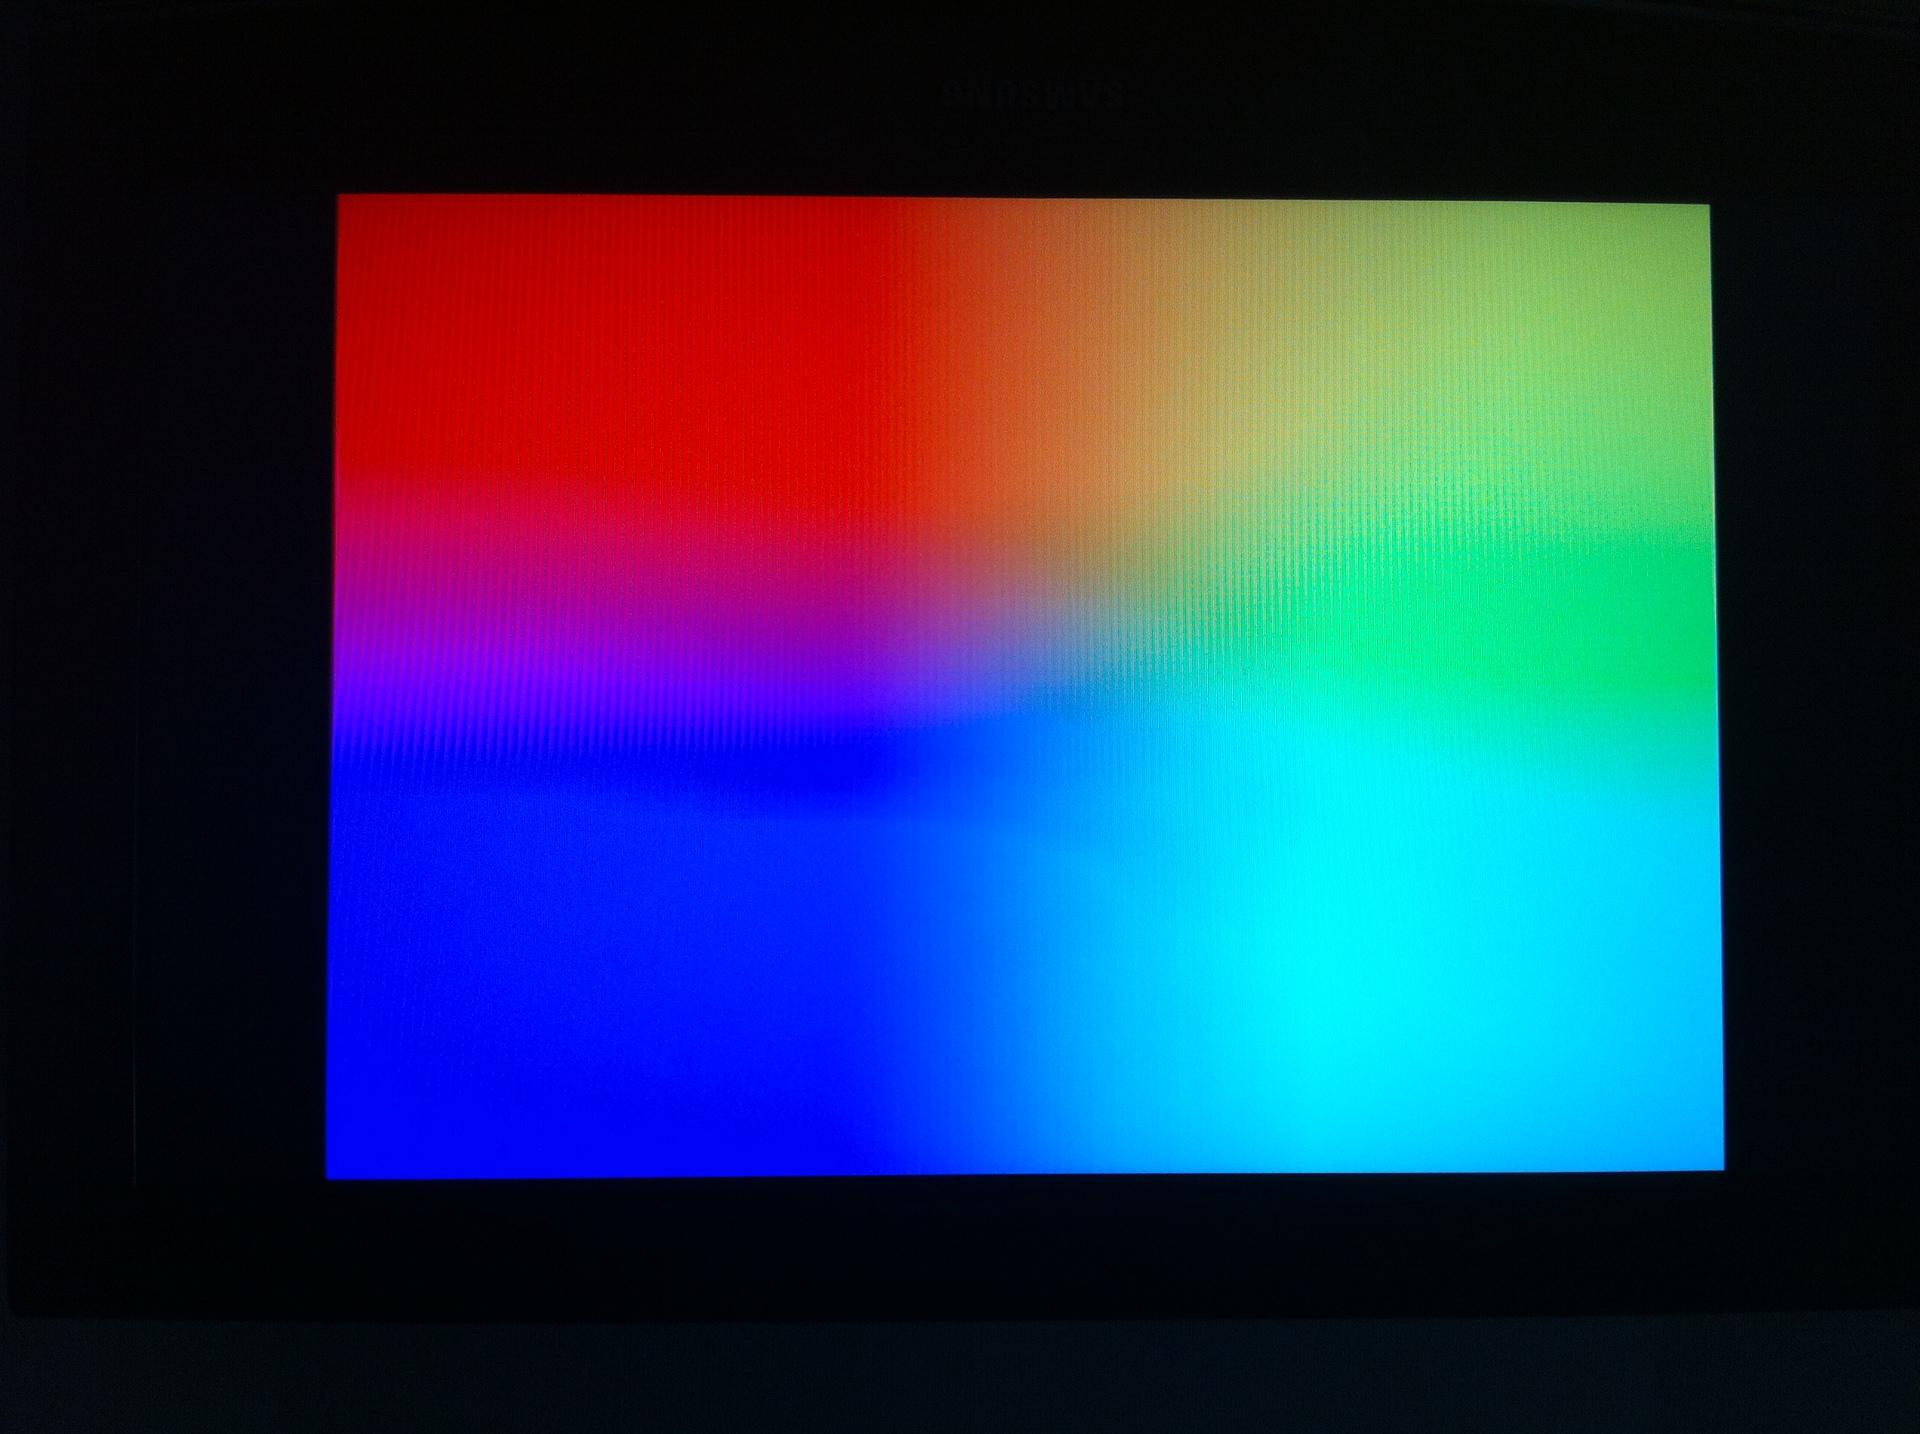 Raspberry Pi Boot Screen